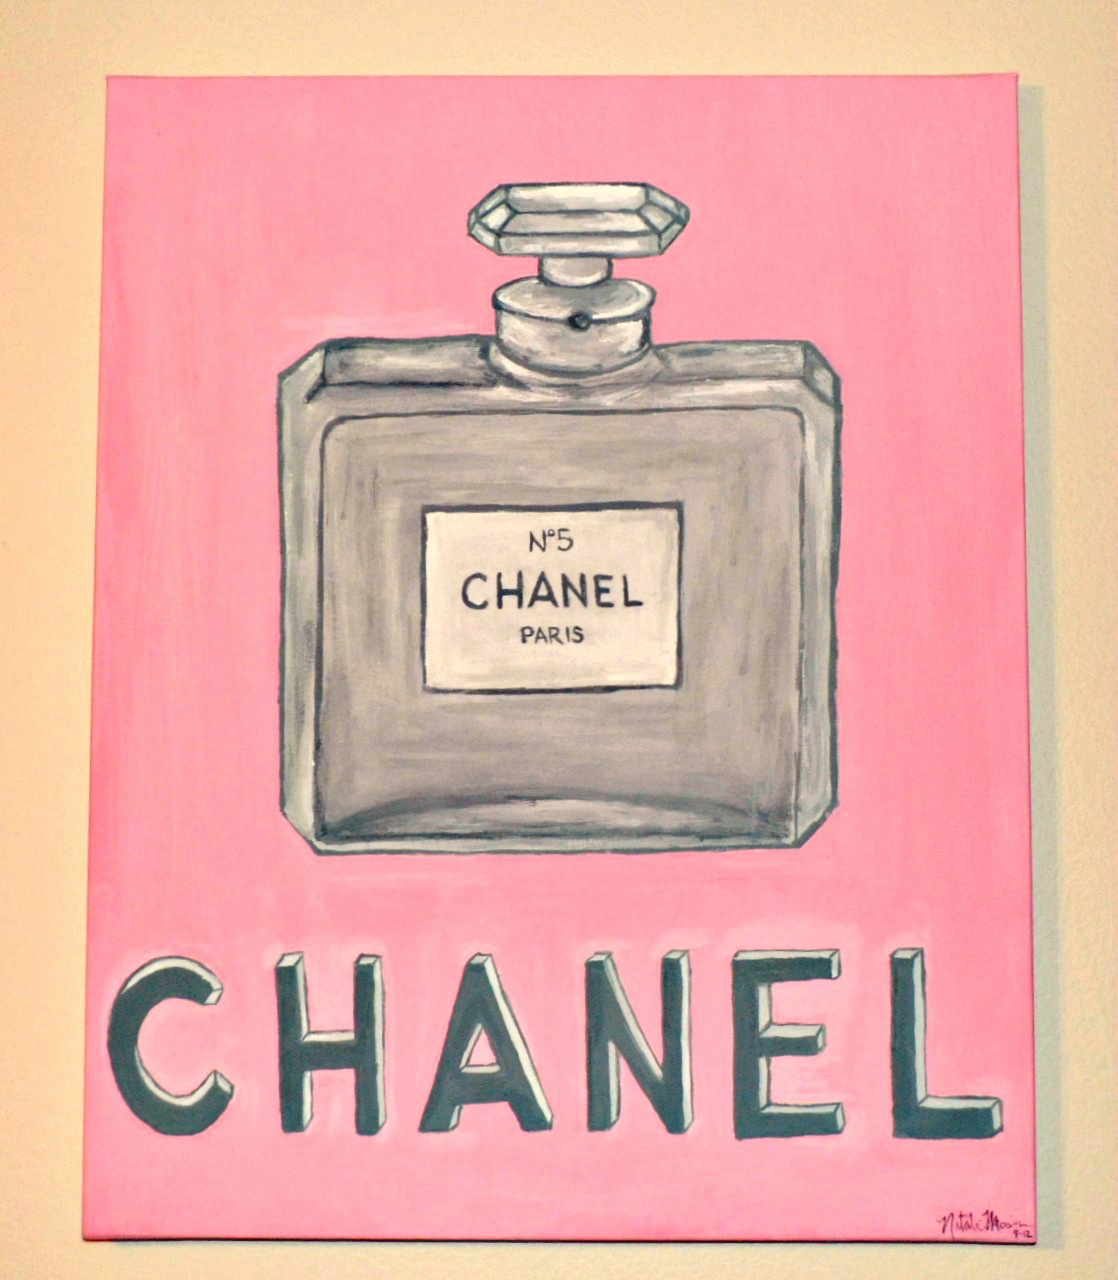 Original Hand Painted Vintage Chanel Perfume Bottle